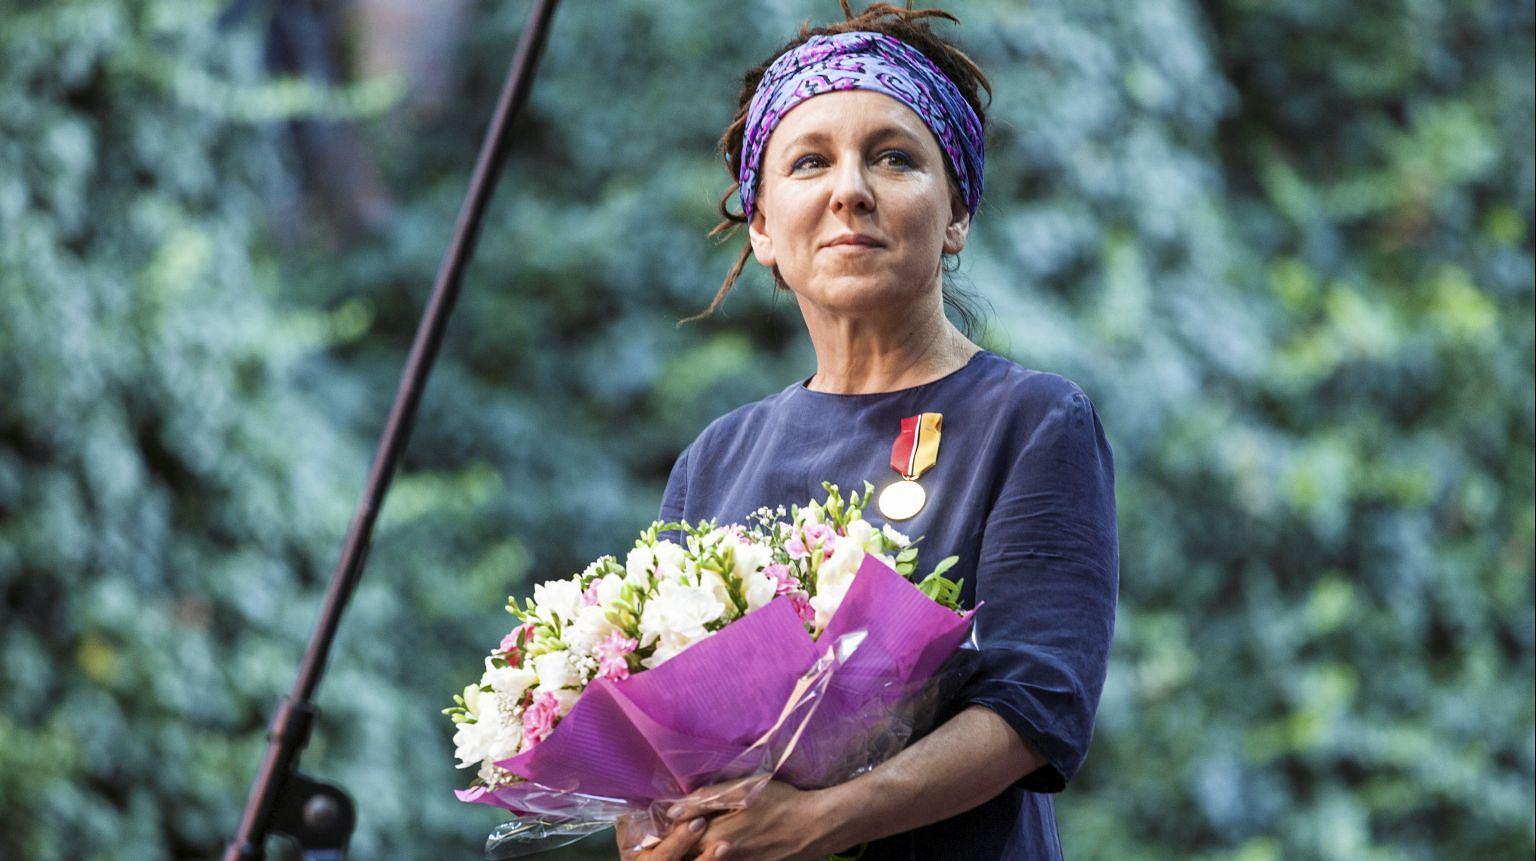 Olg Tokarczuk jest pierwszą polską laureatką International Man Booker Prize